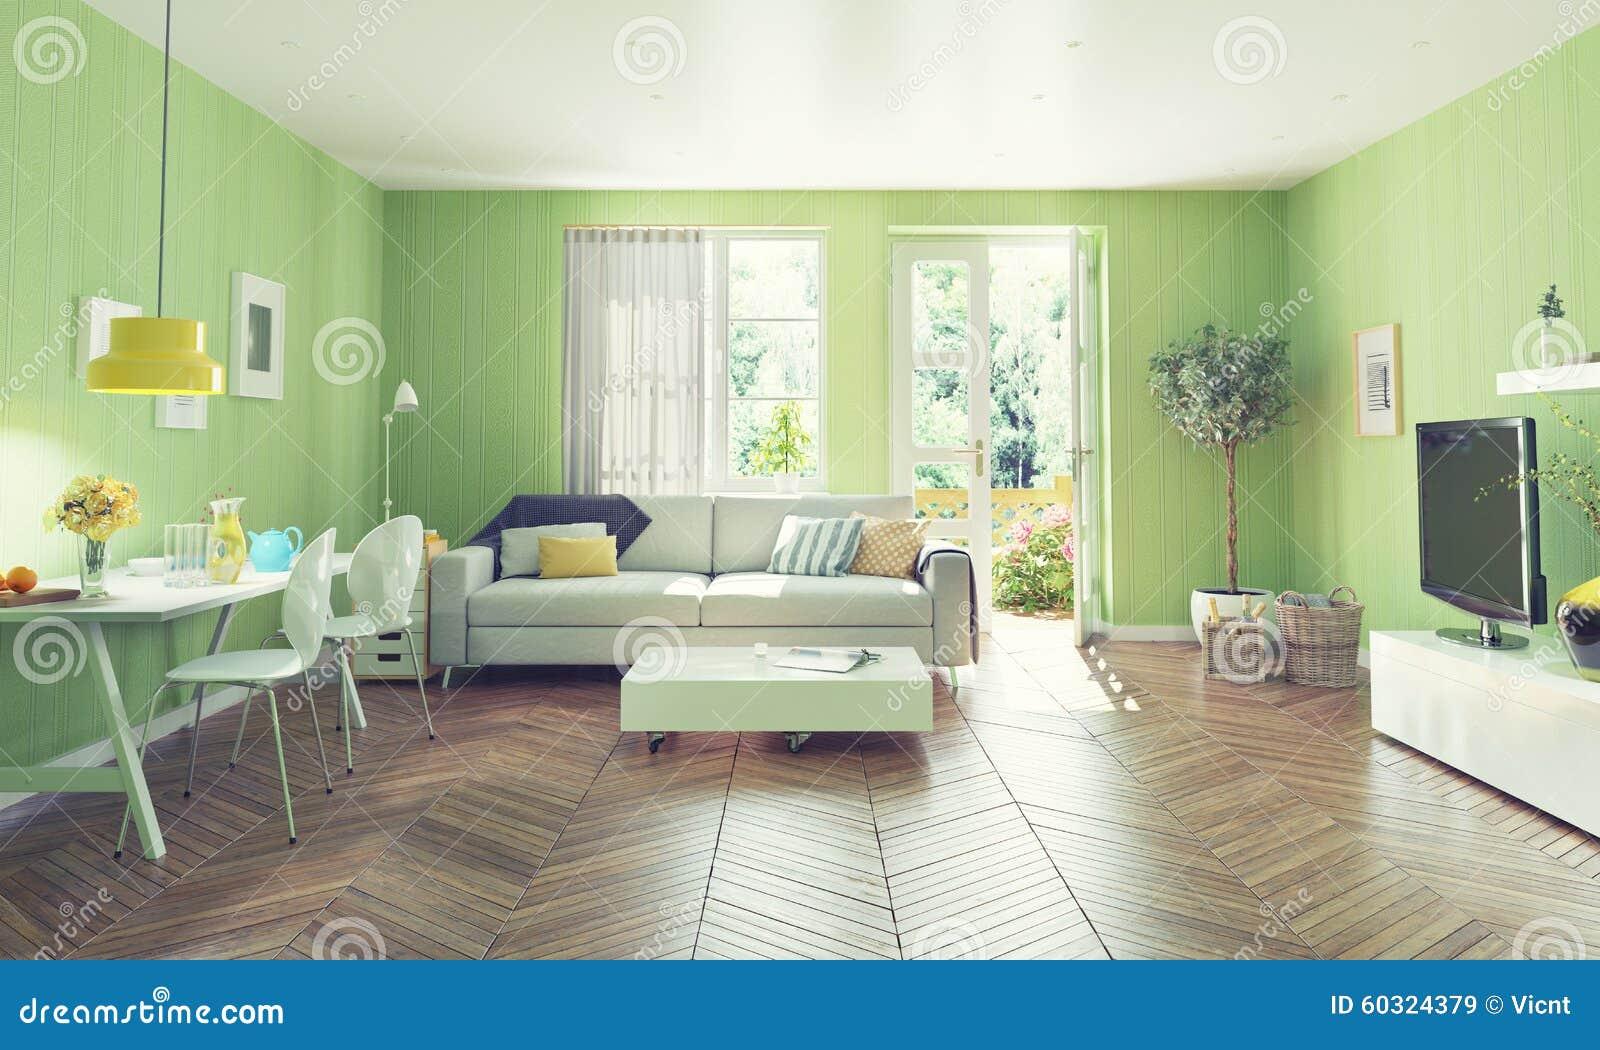 Modern living room stock illustration image 60324379 for Modern living room concepts